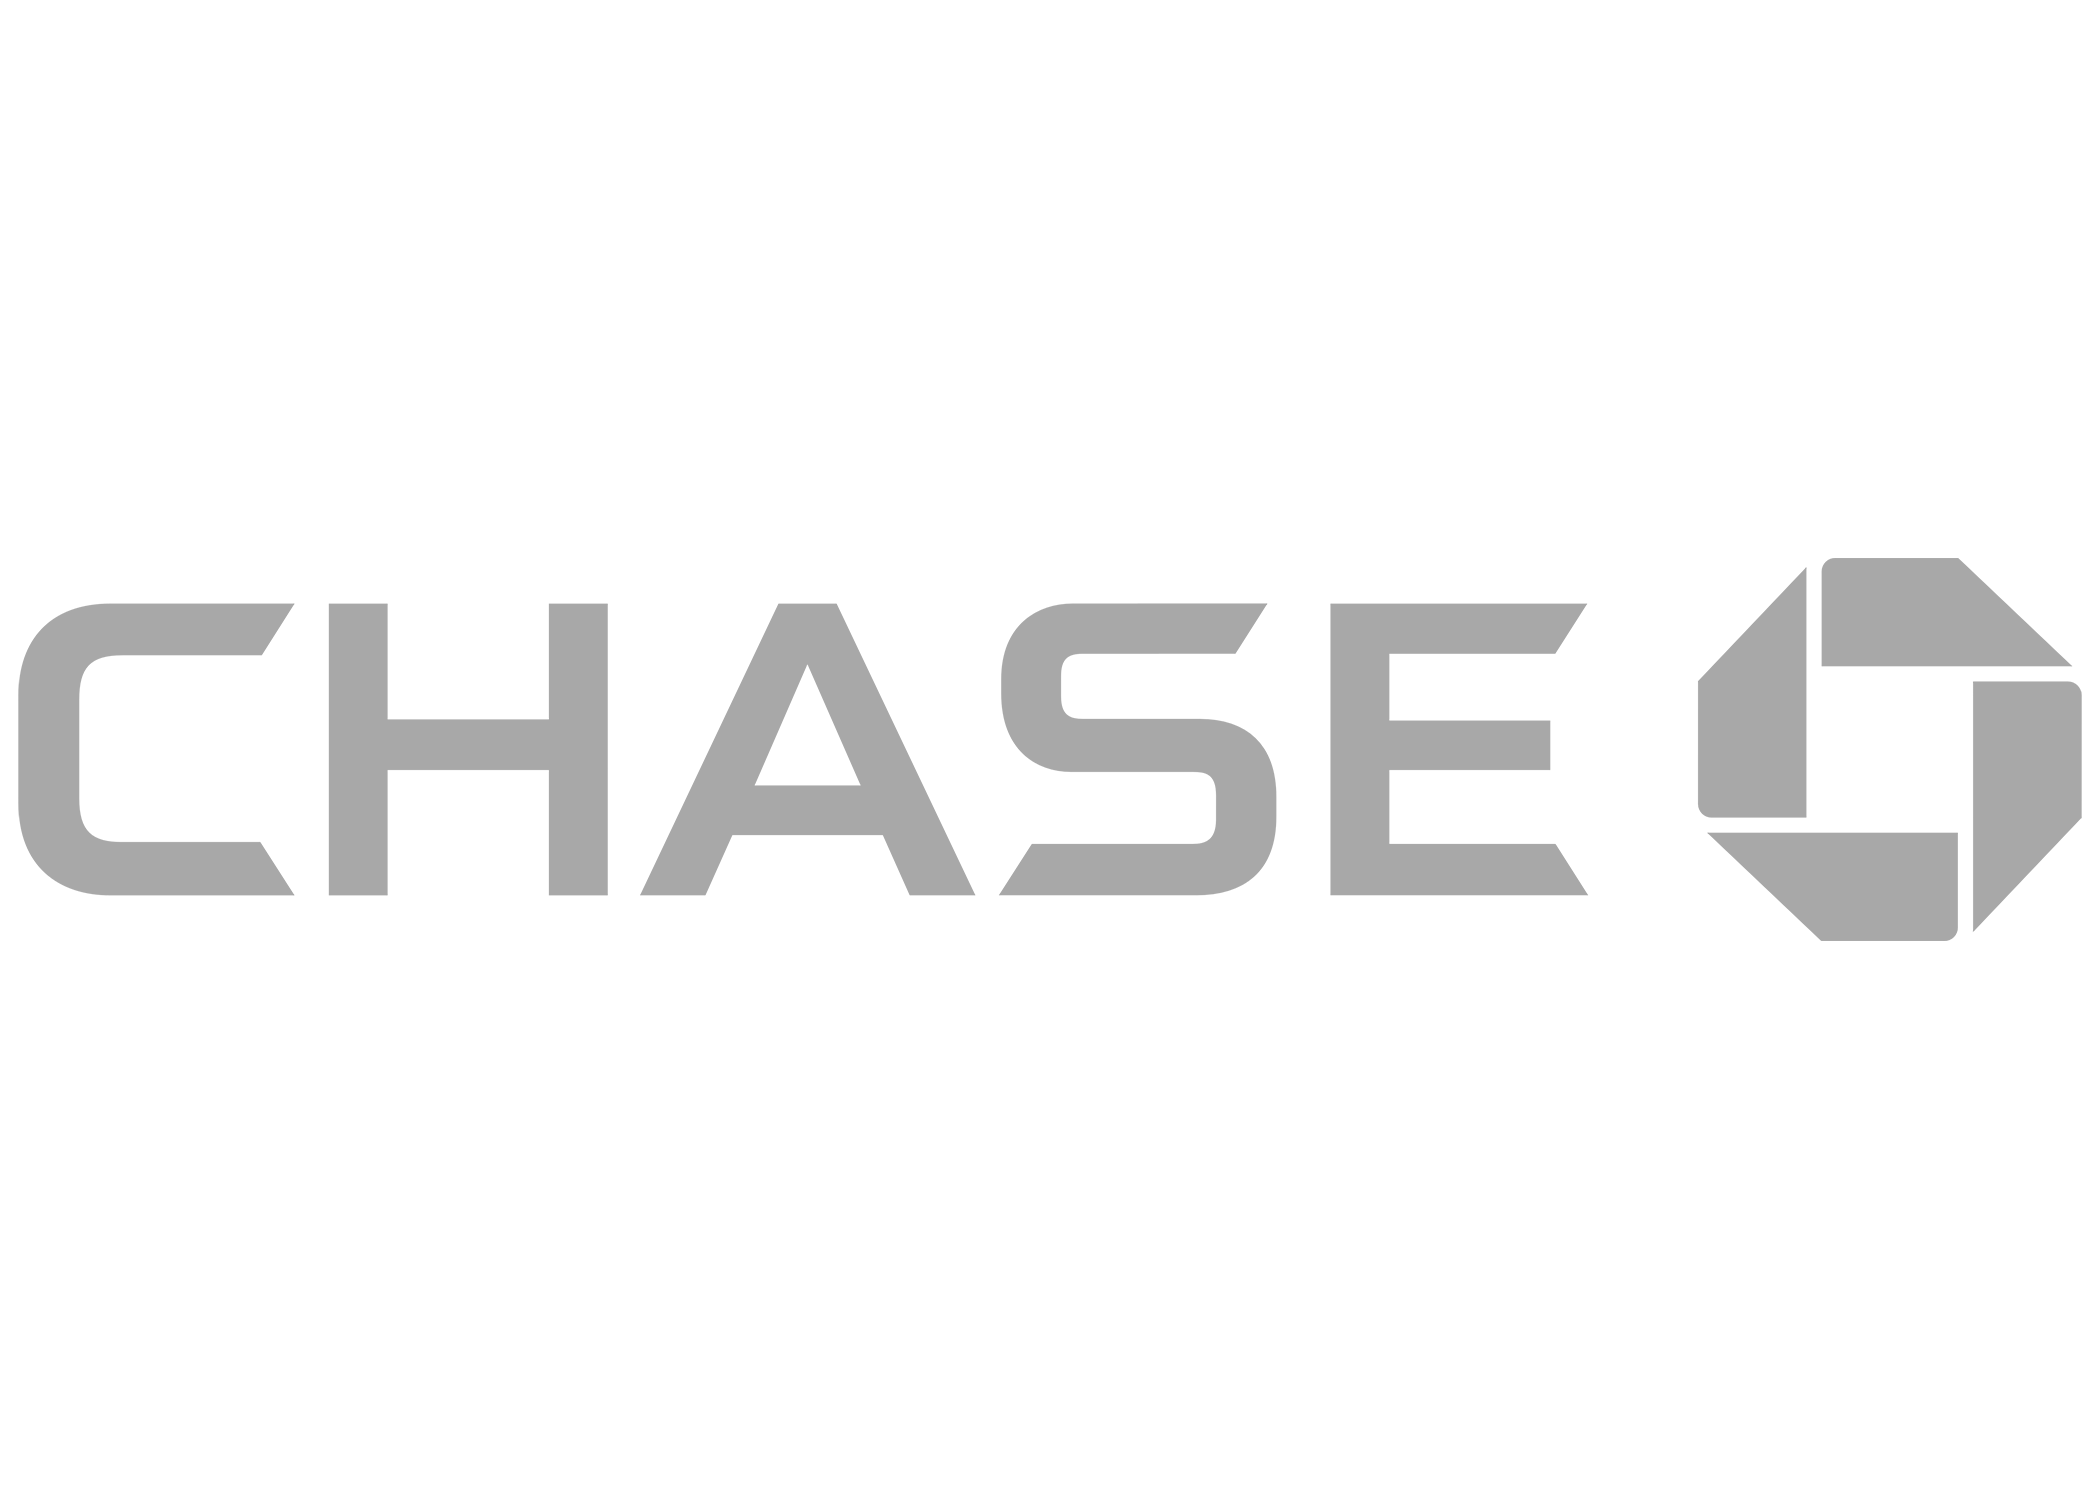 https://149346020.v2.pressablecdn.com/wp-content/uploads/2017/08/Chase.png